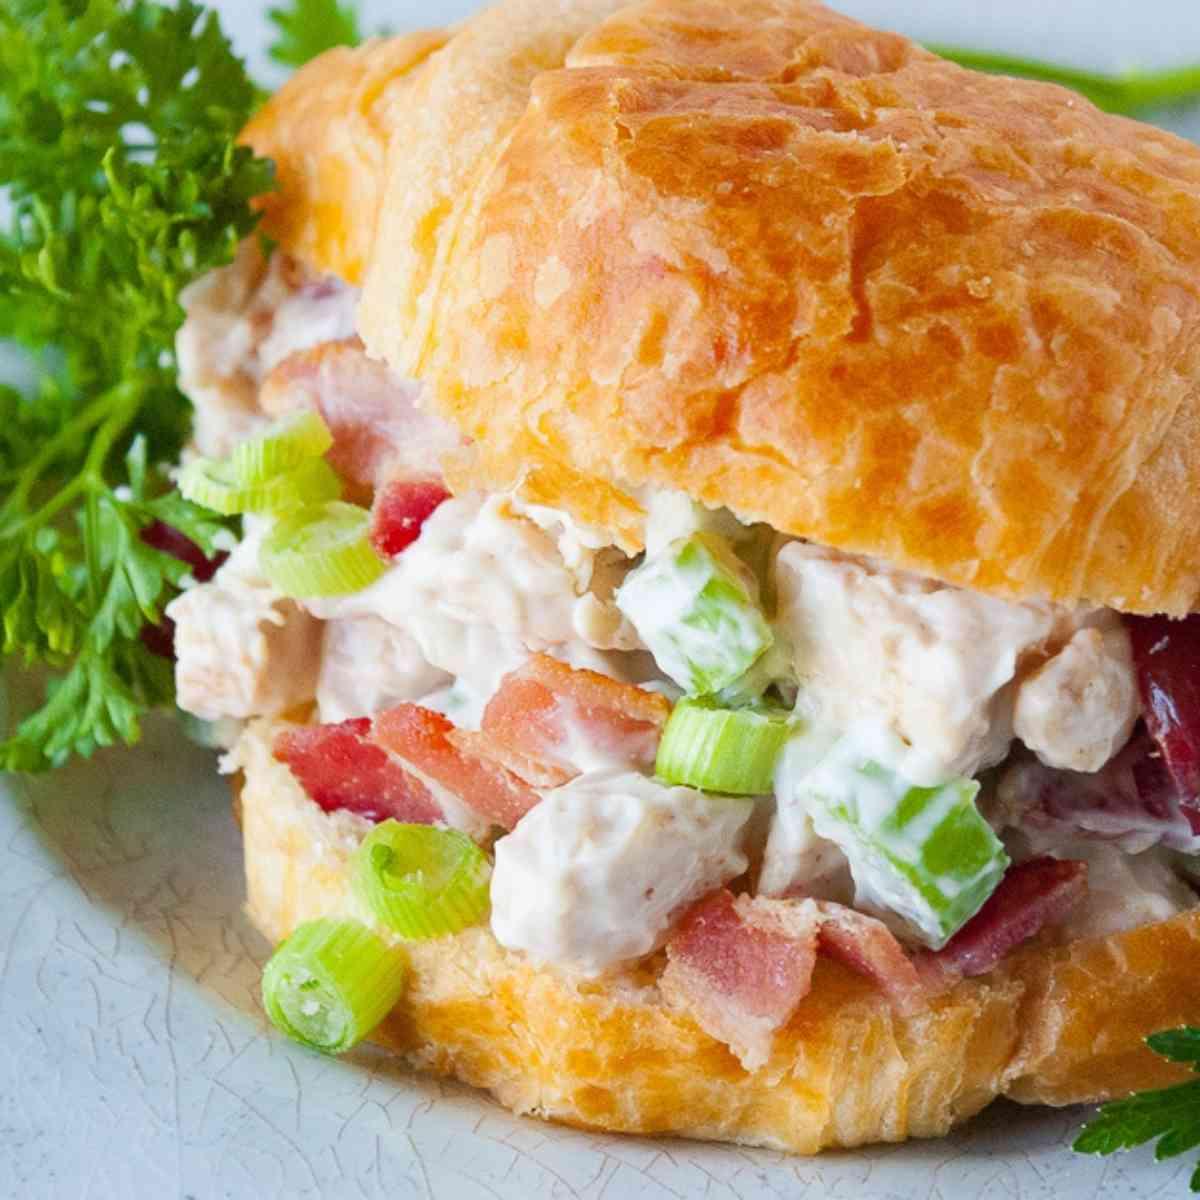 Chicken salad croissant sandwich garnished with parsley.